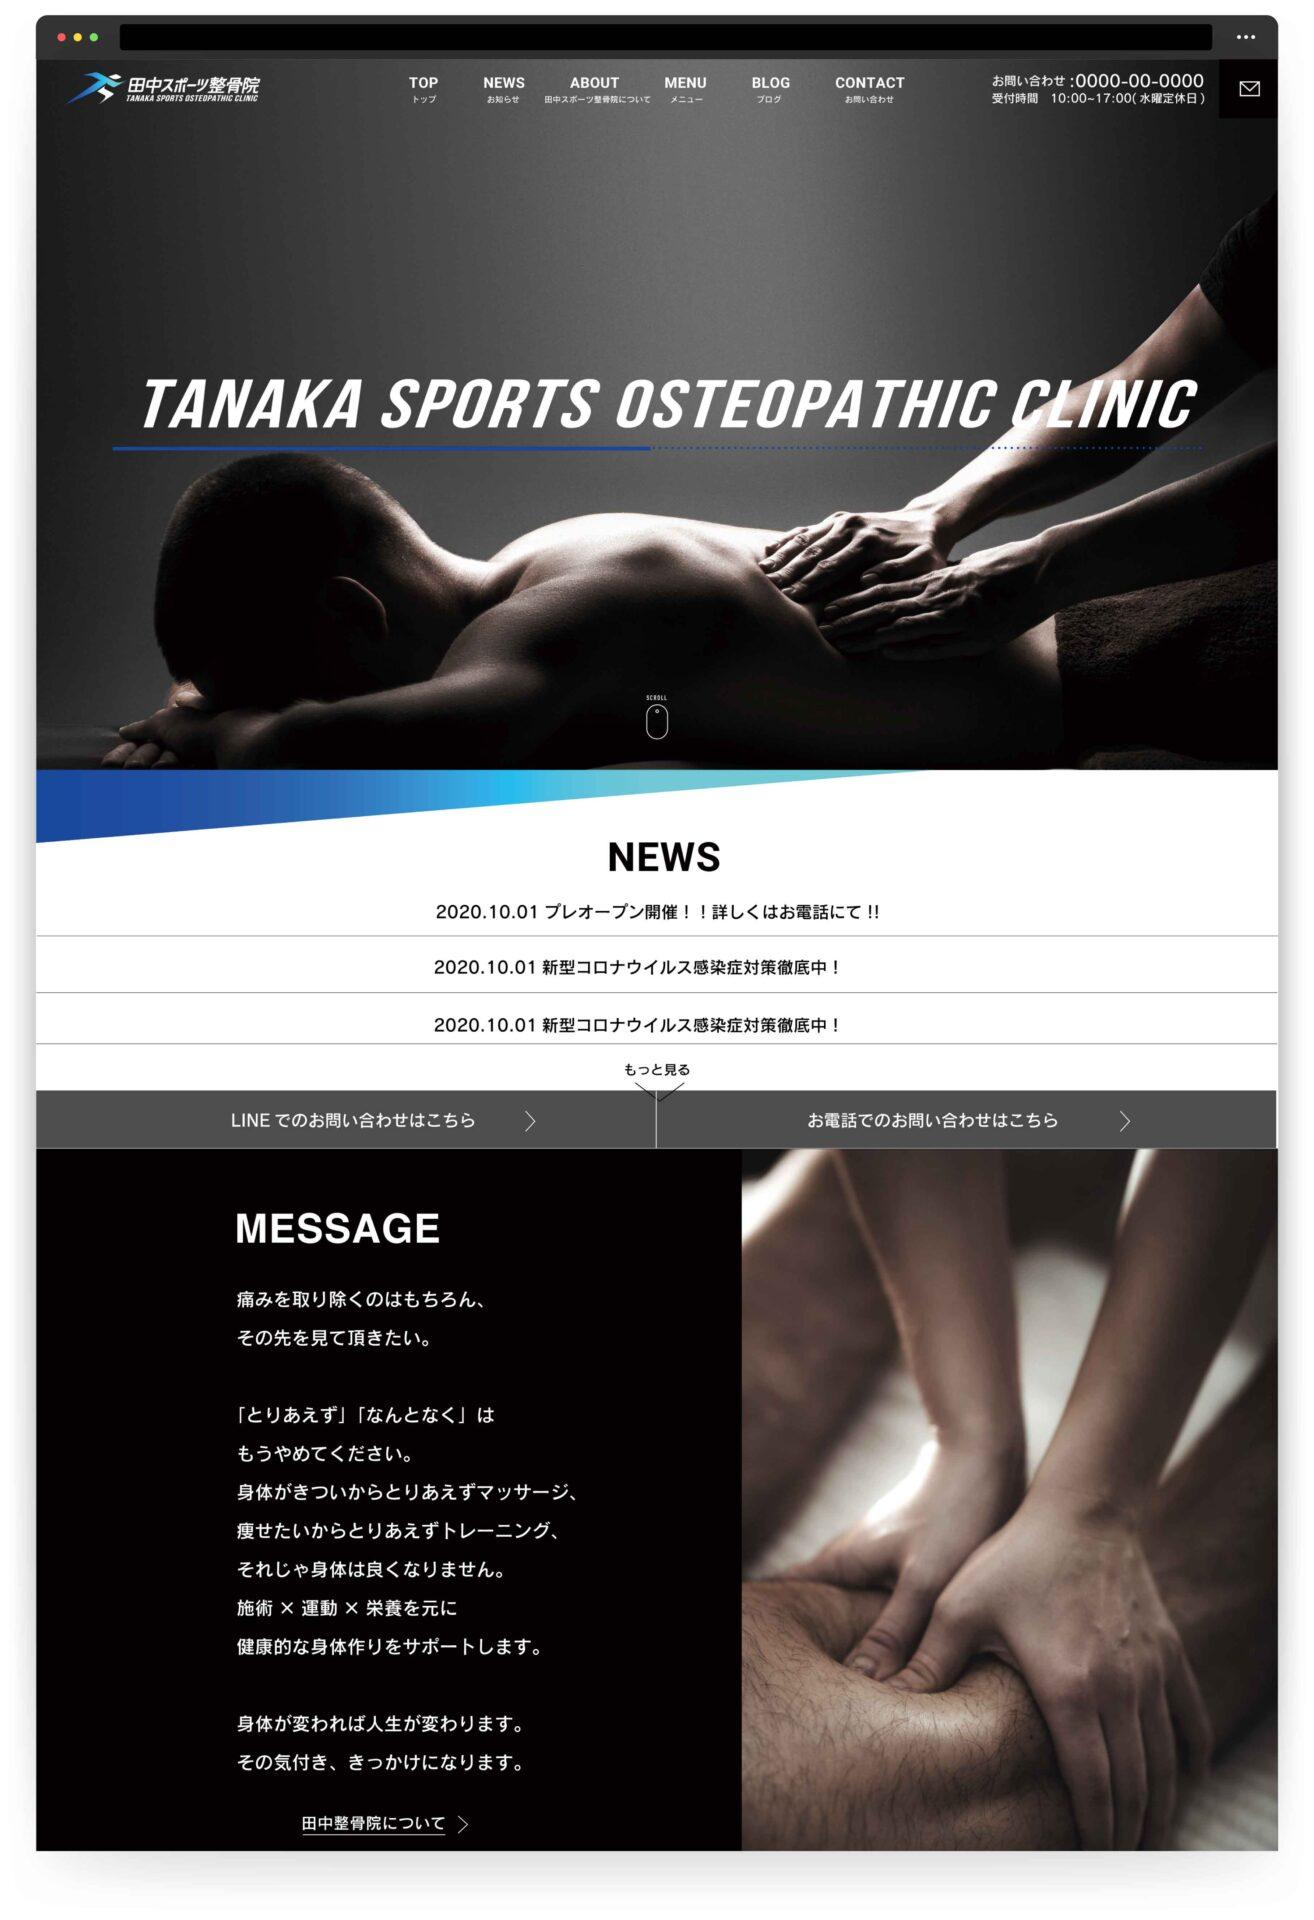 「TANAKA SPORTS OSTEOPATHIC CLINIC」の実績画像